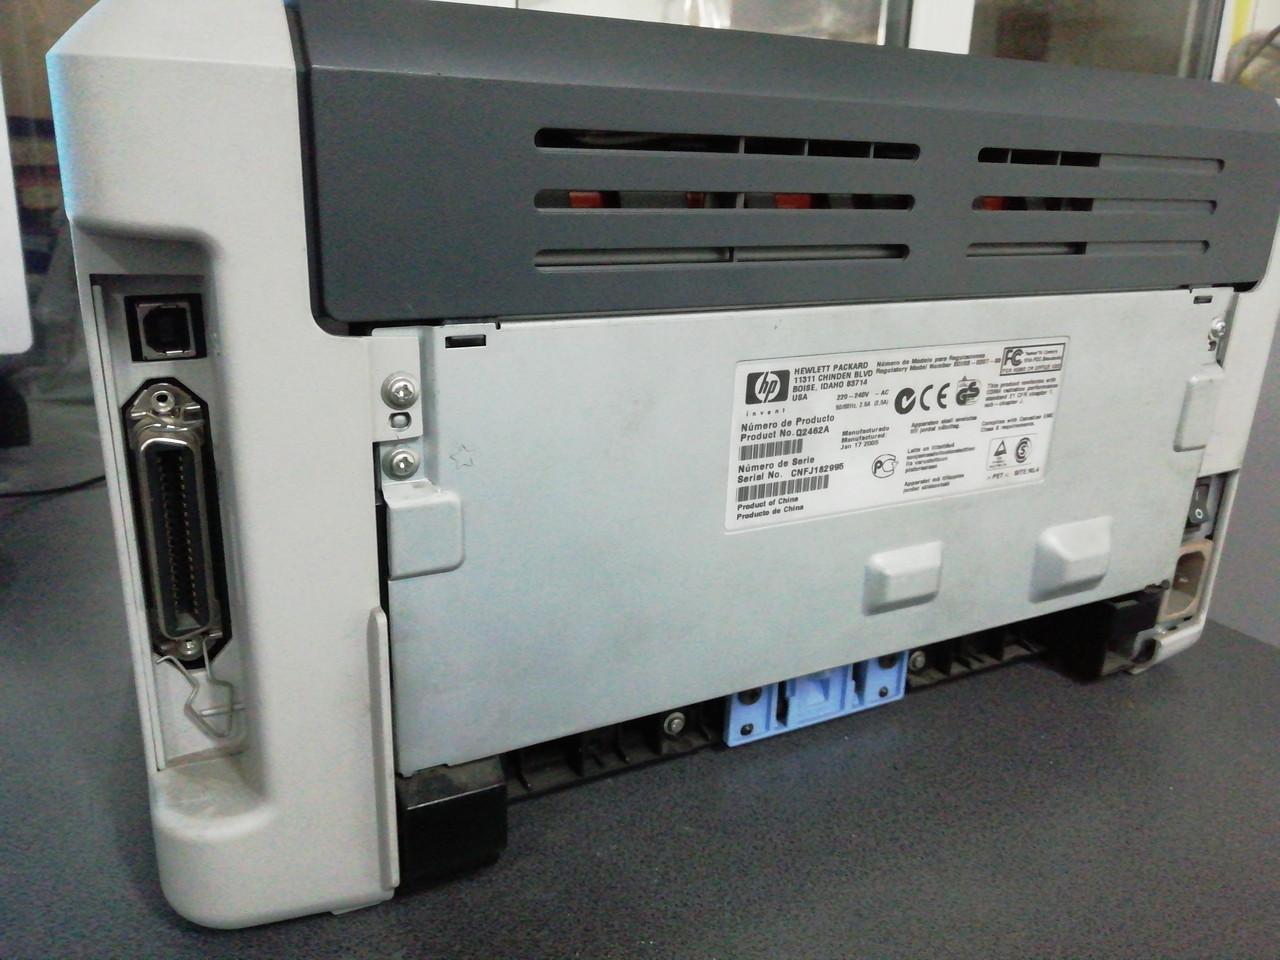 Продам принтер HP LaserJet 1015 малютка под usb